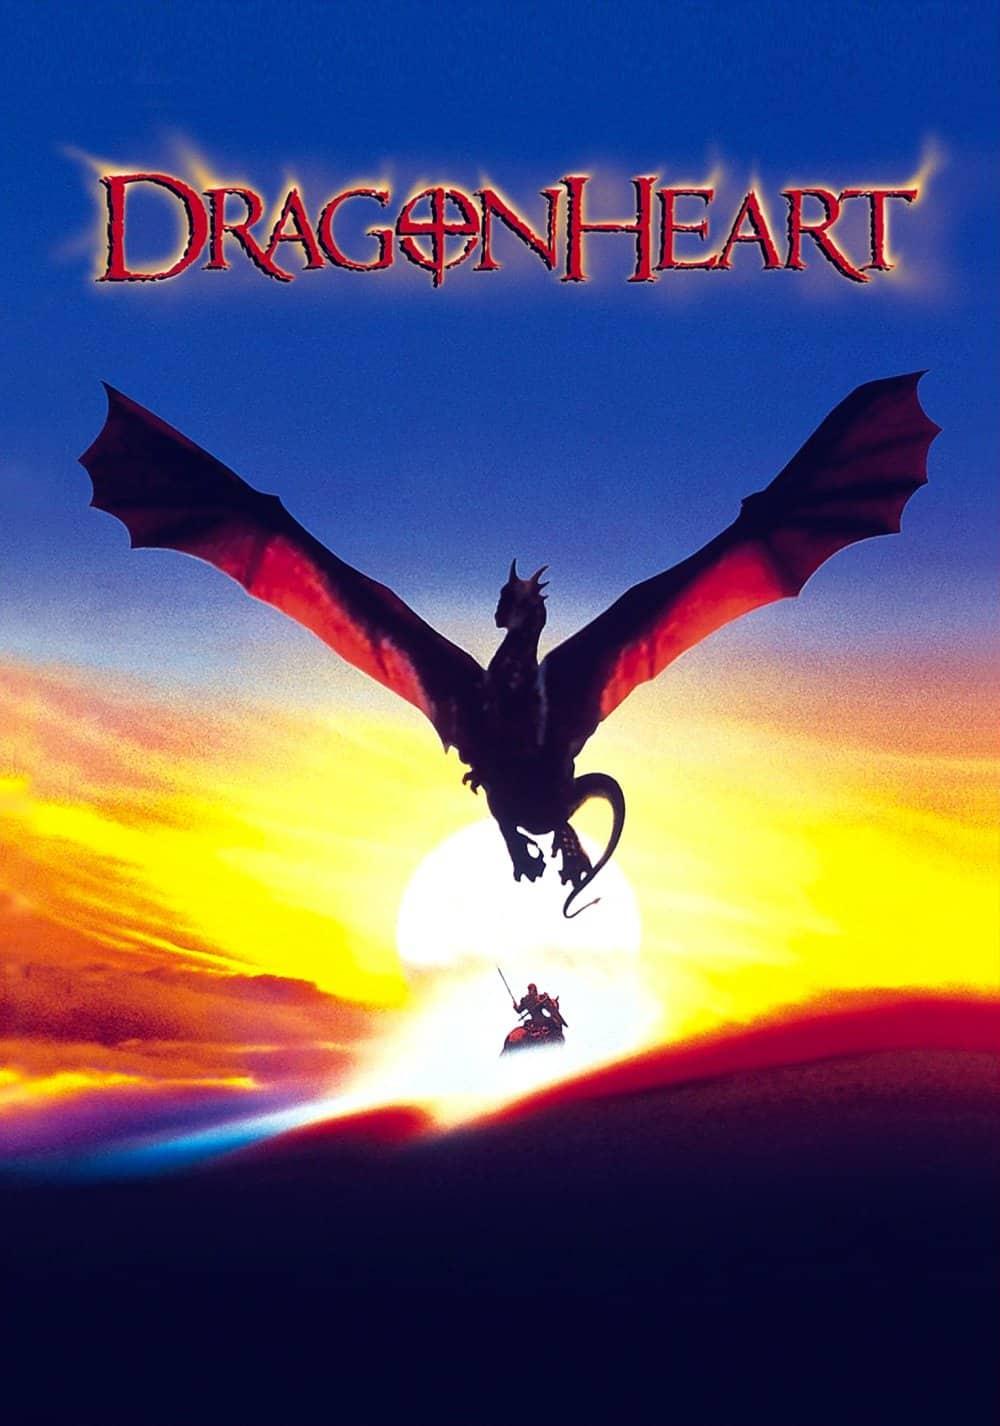 Dragonheart, 1996